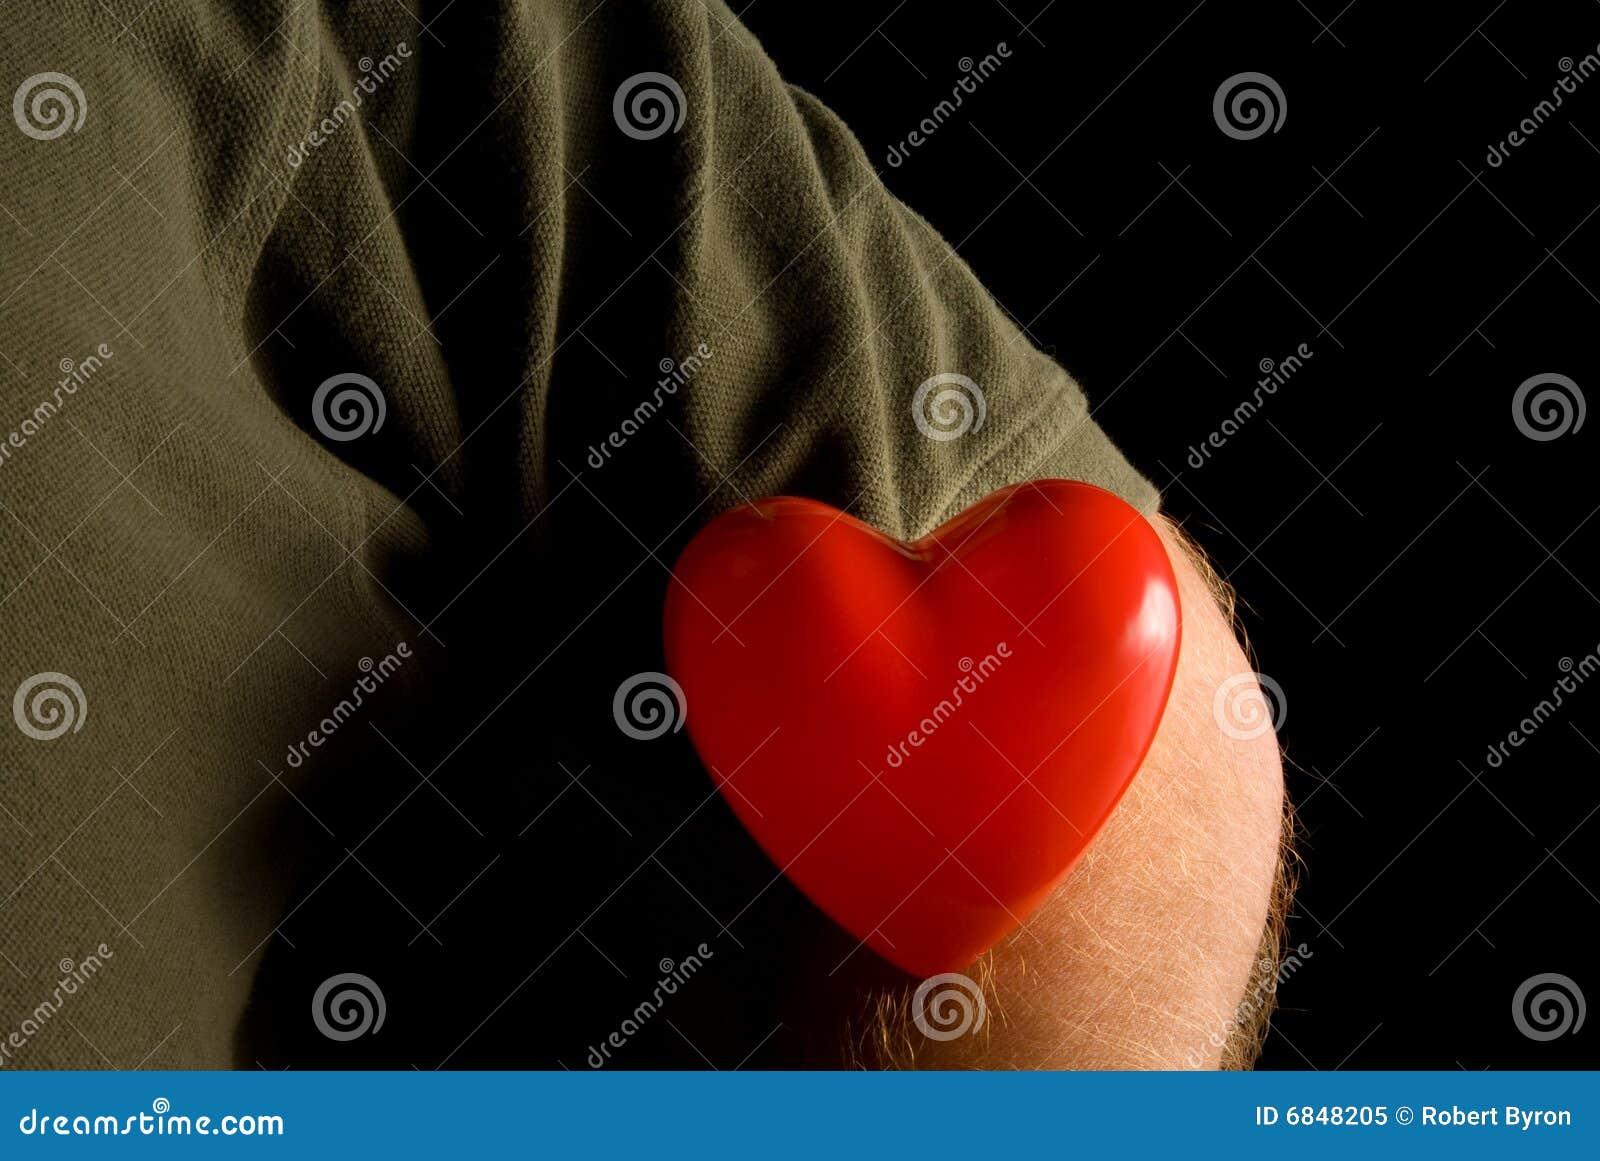 Serce na Rękawie